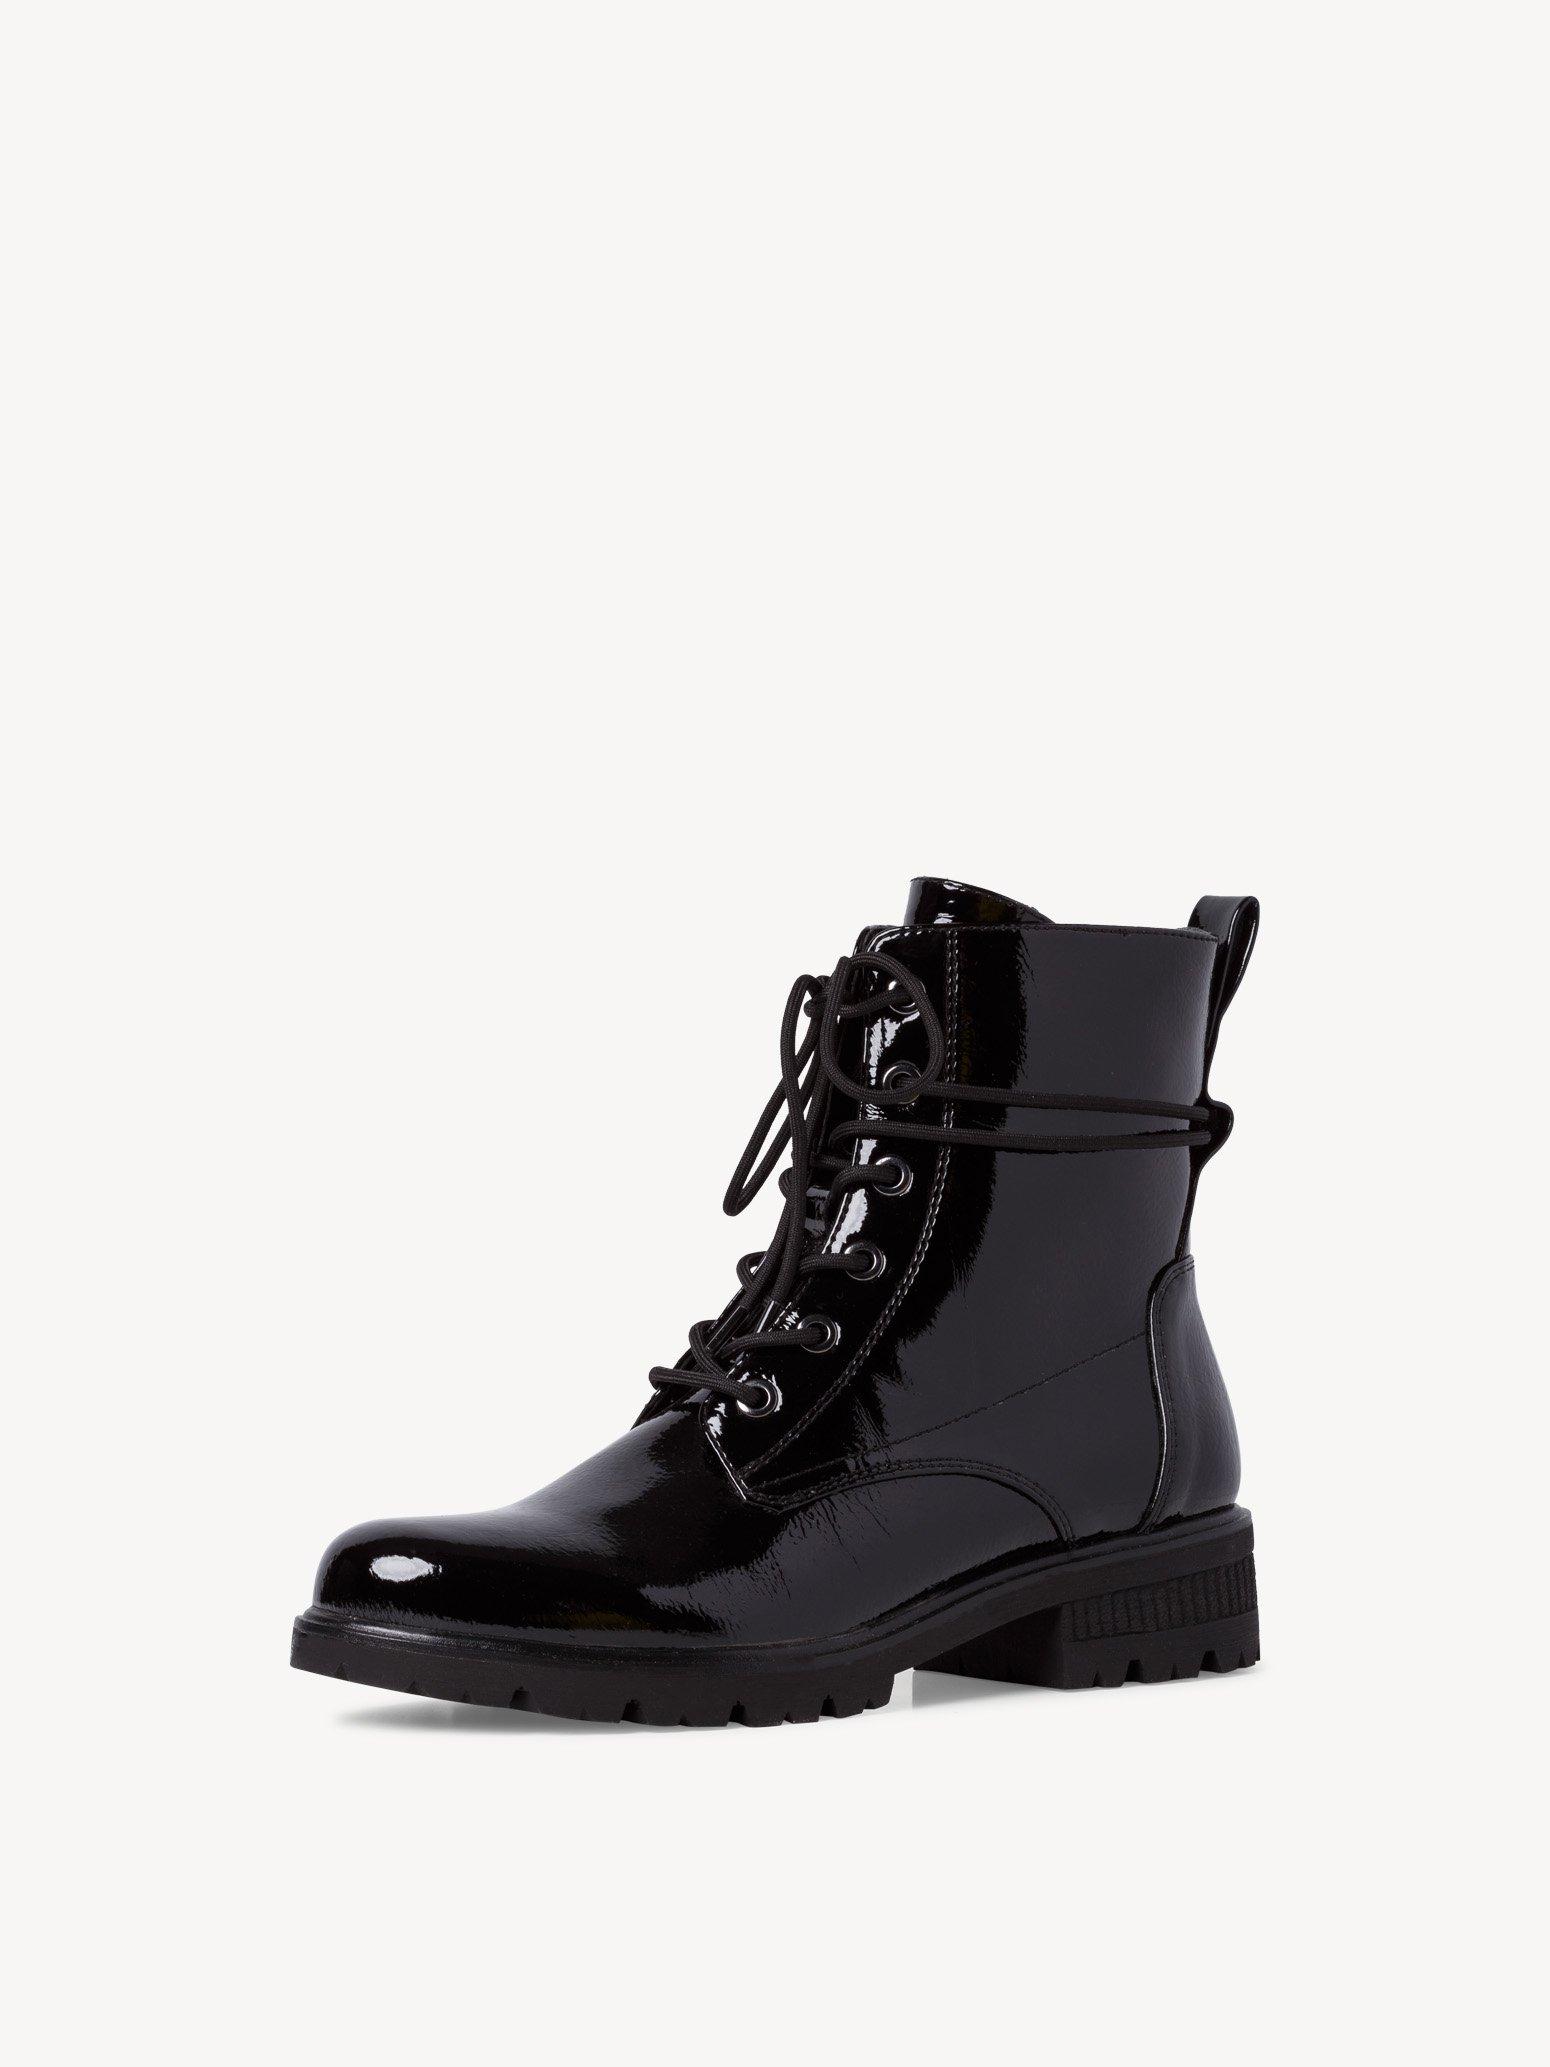 Ботинки Tamaris 1-1-25280-27-018